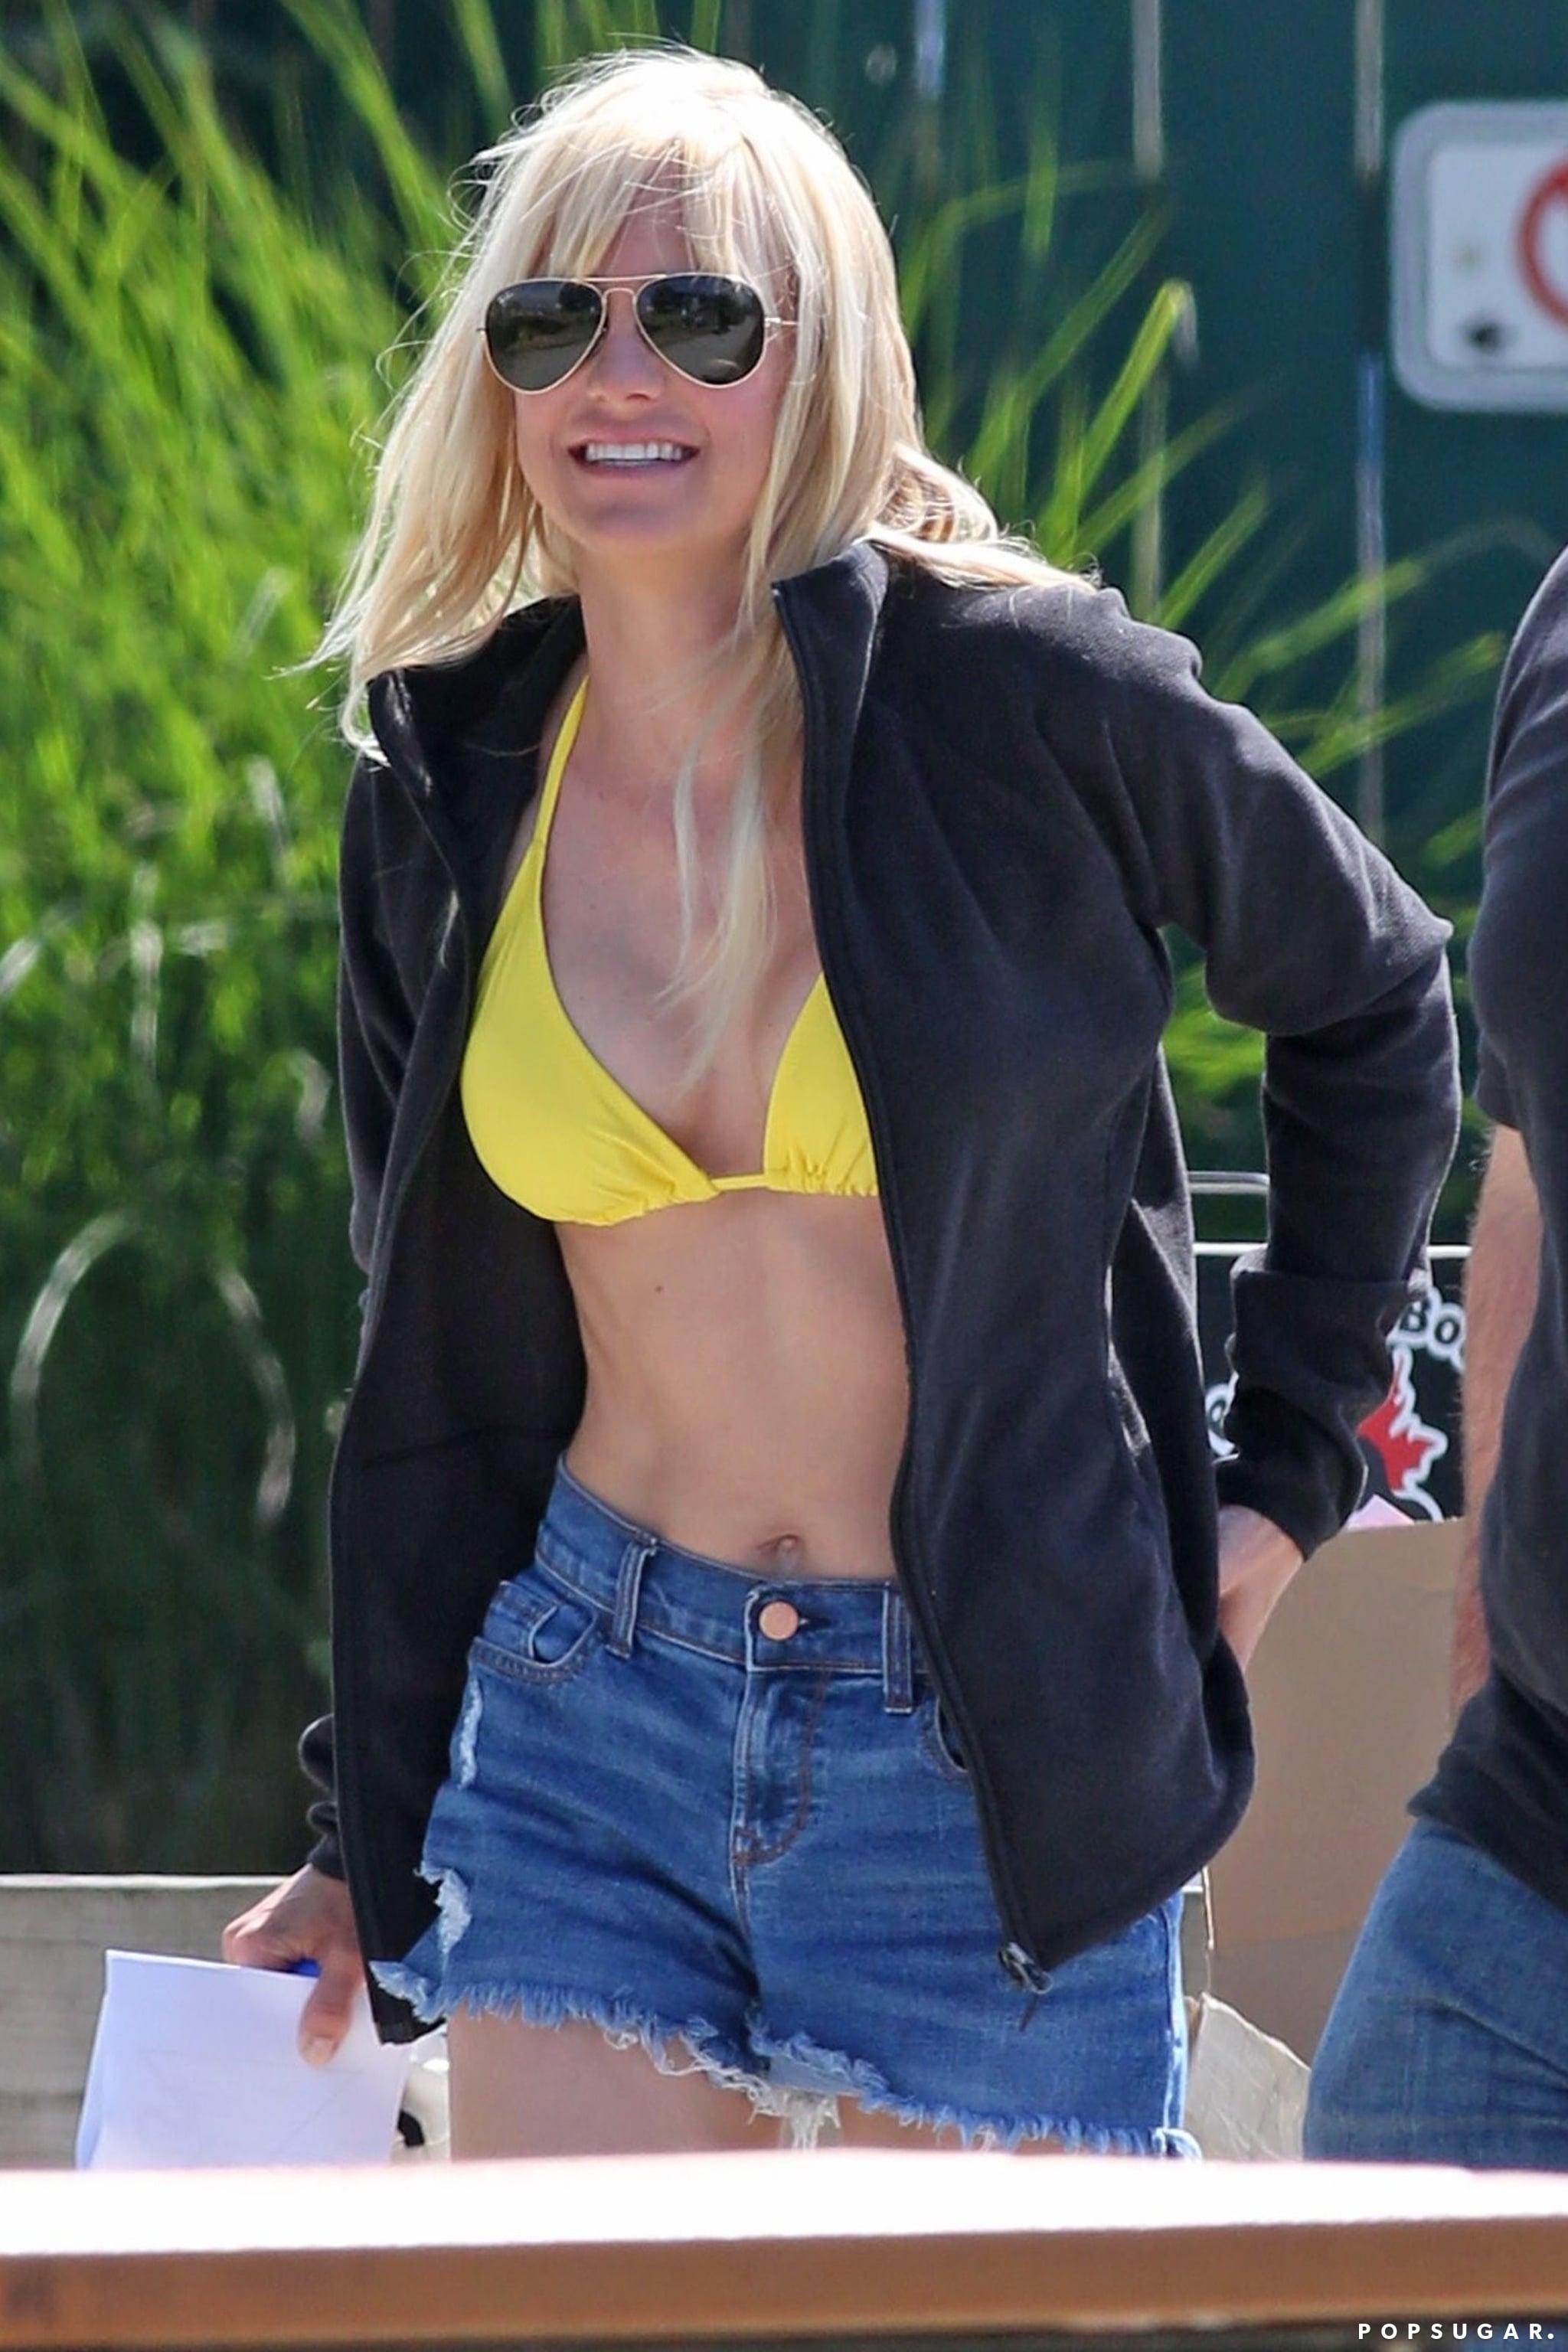 Anna Faris Filming Overboard In A Bikini Pictures June 2017 Popsugar Celebrity